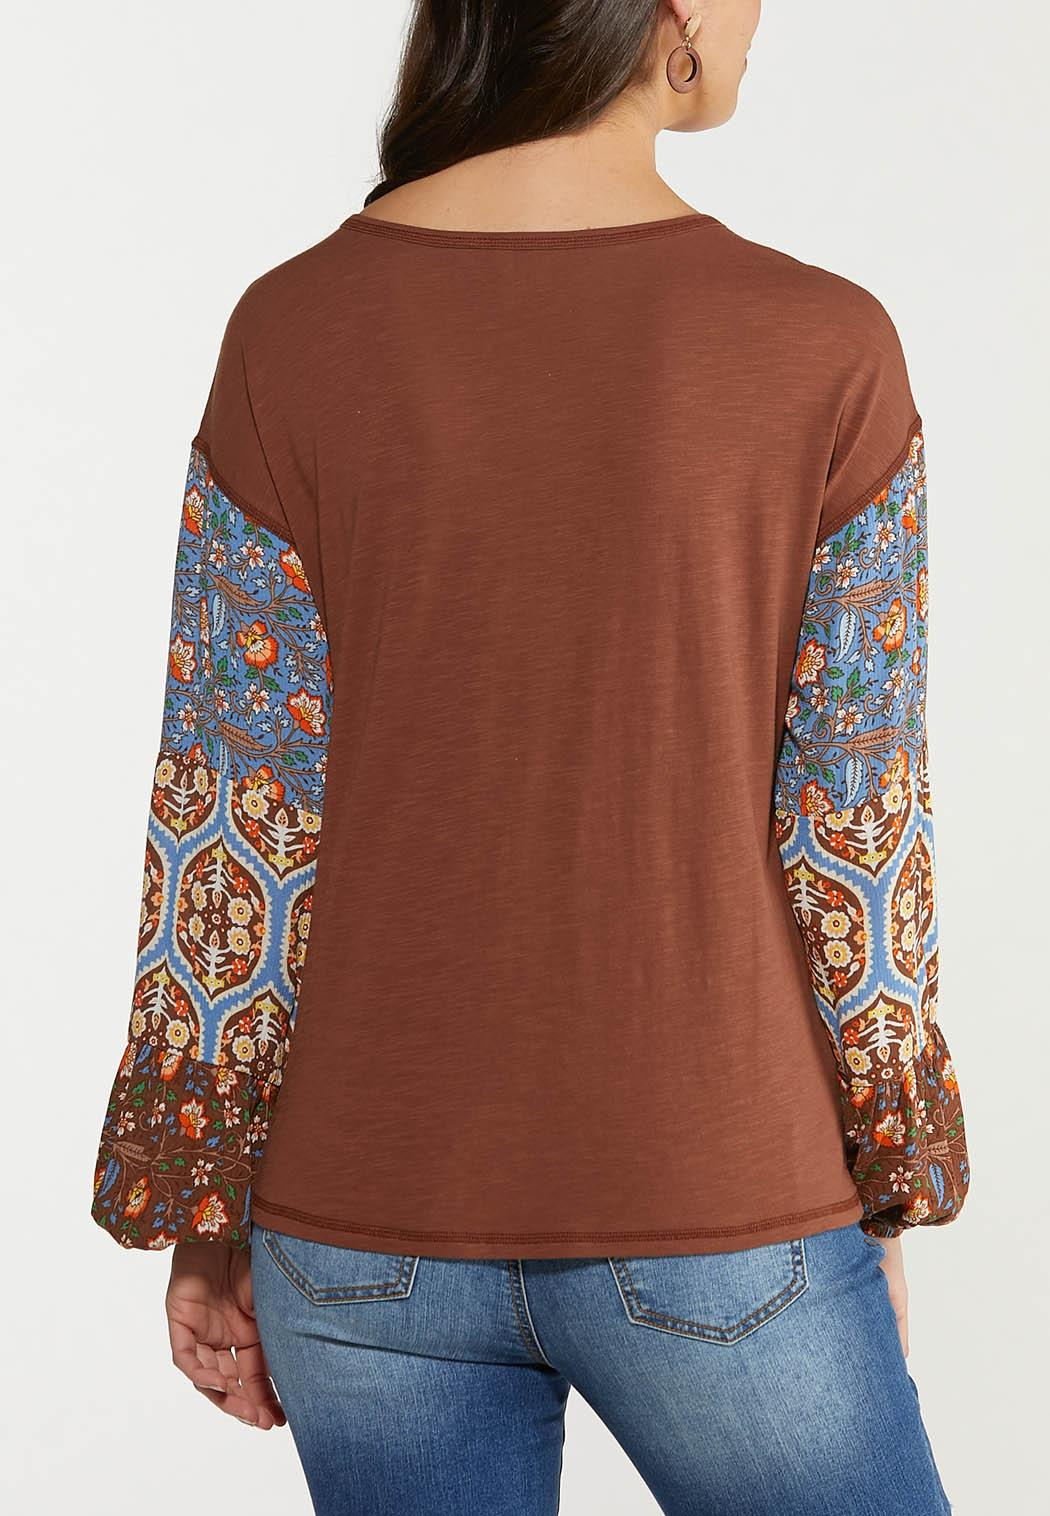 Plus Size Contrast Floral Sleeve Top (Item #44515592)